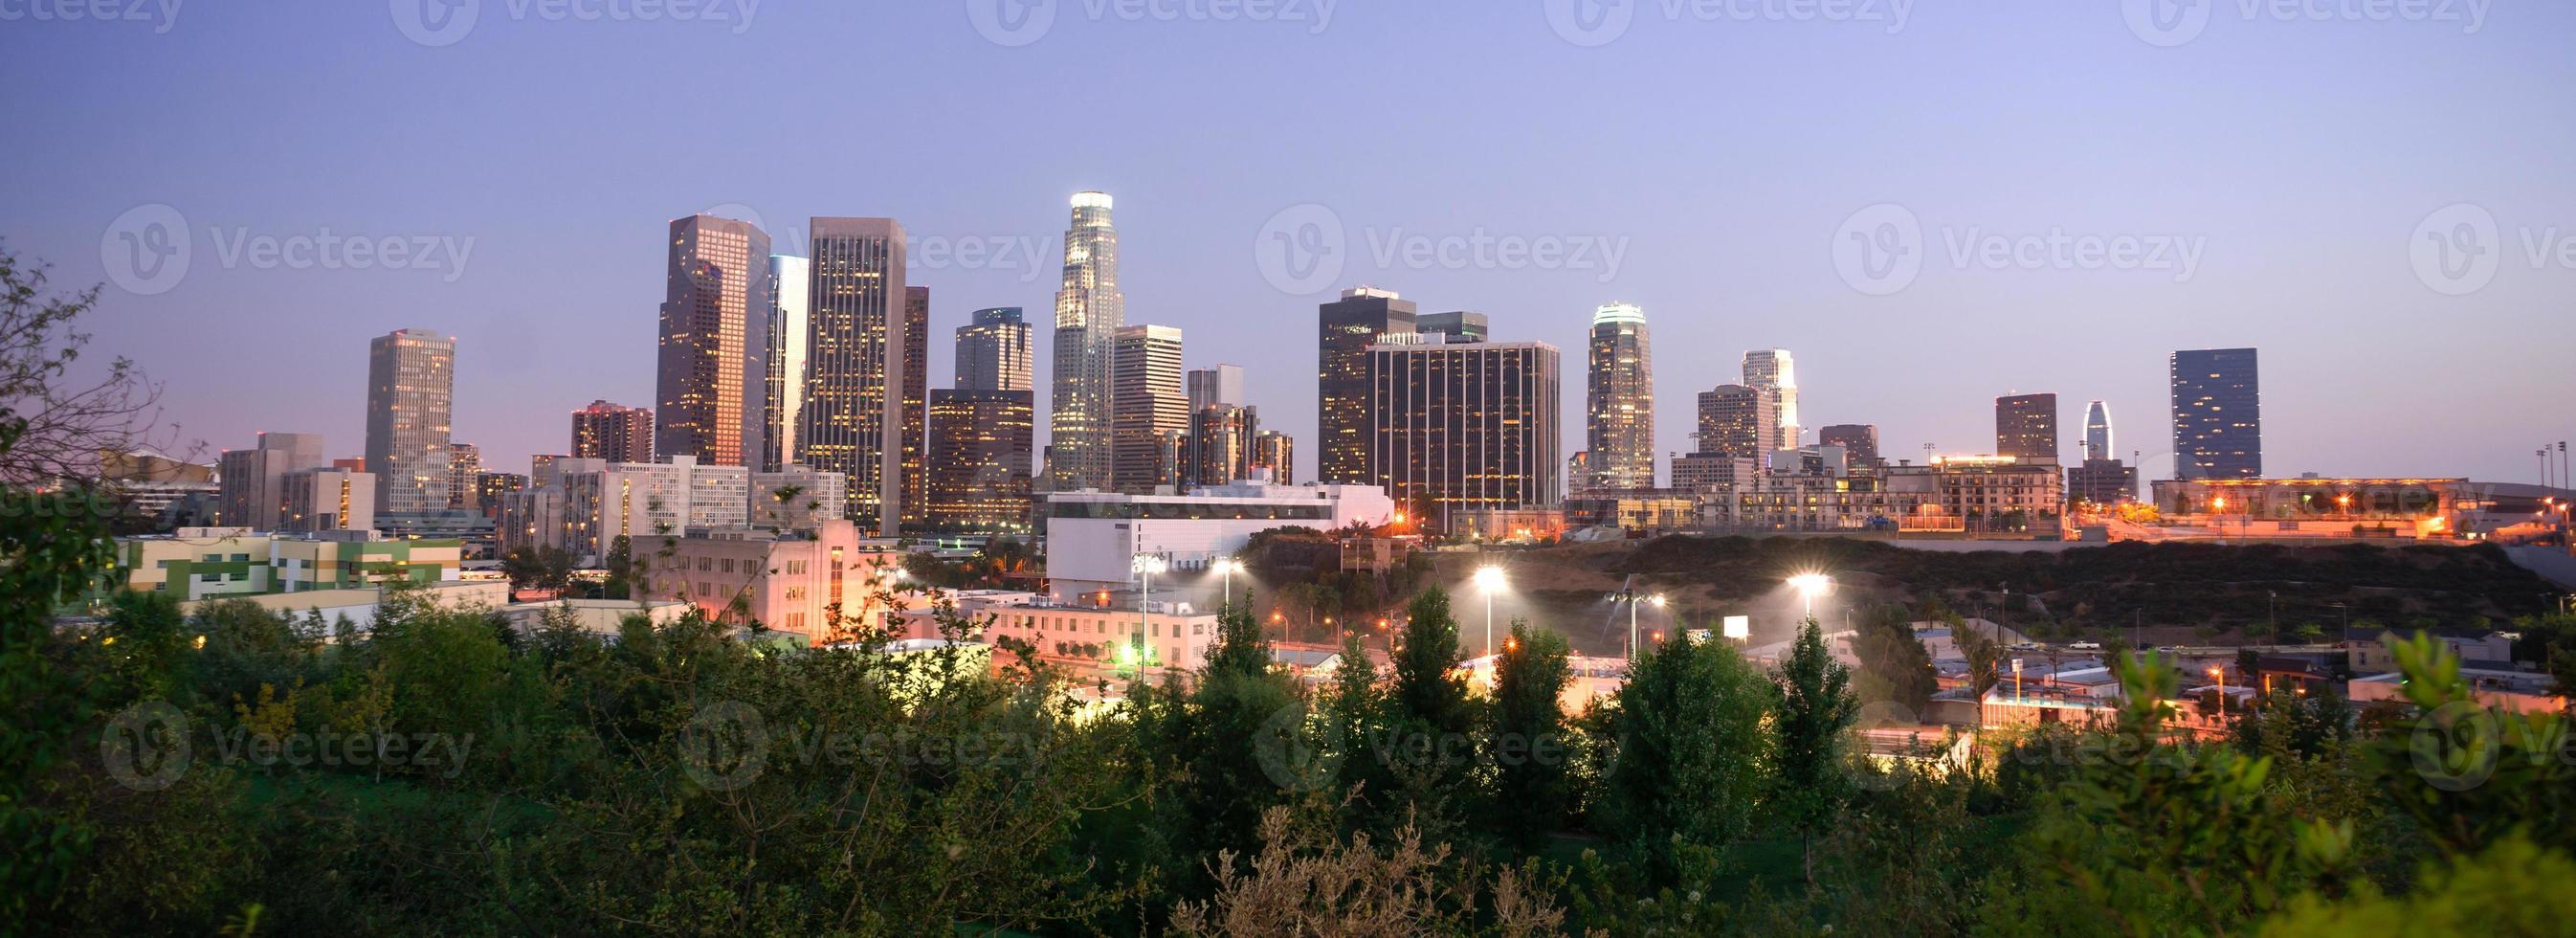 Sunset Los Angeles California Downtown City Skyline photo